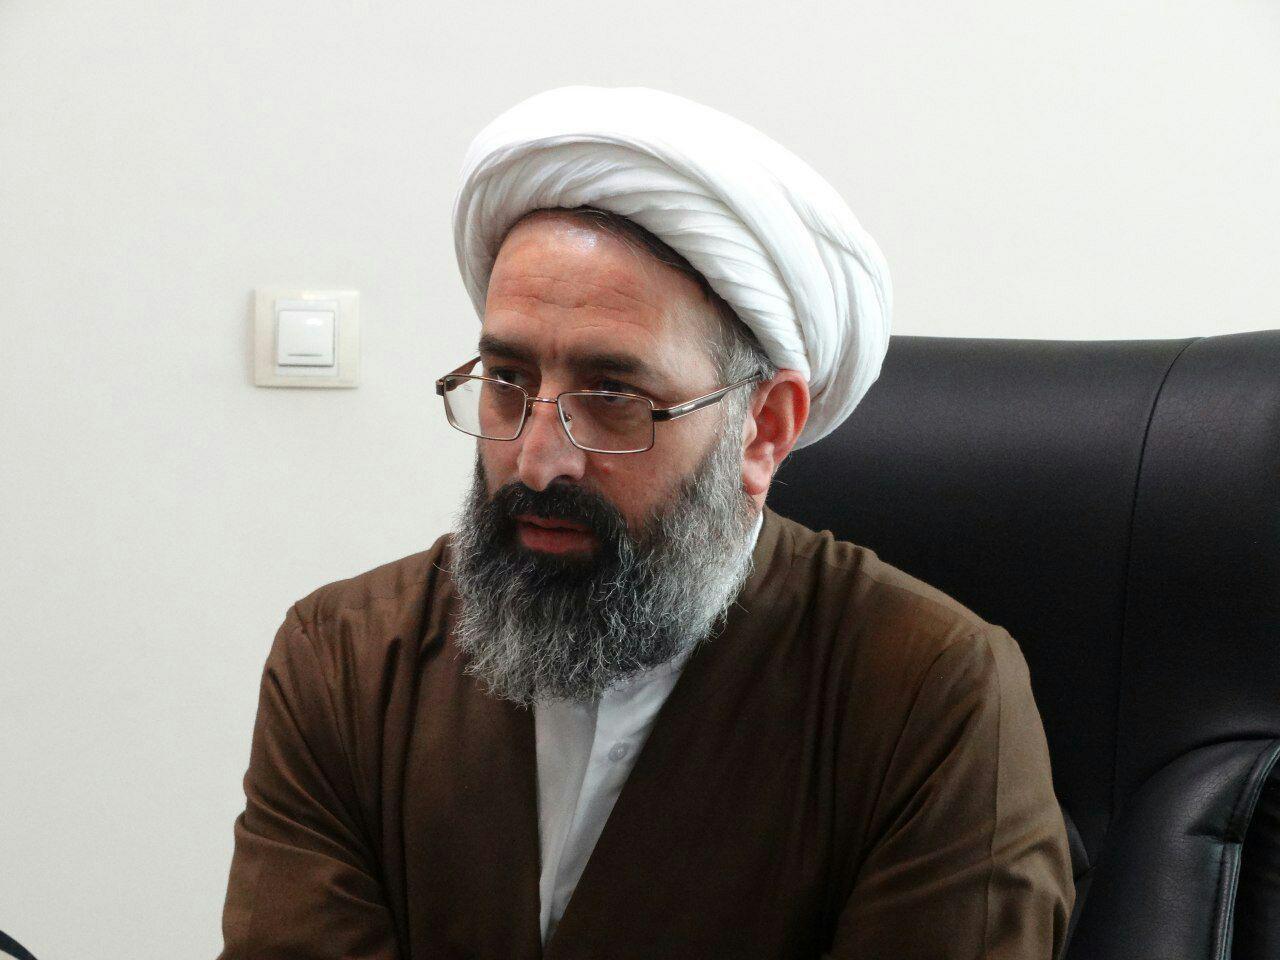 حجت الاسلام اکبری